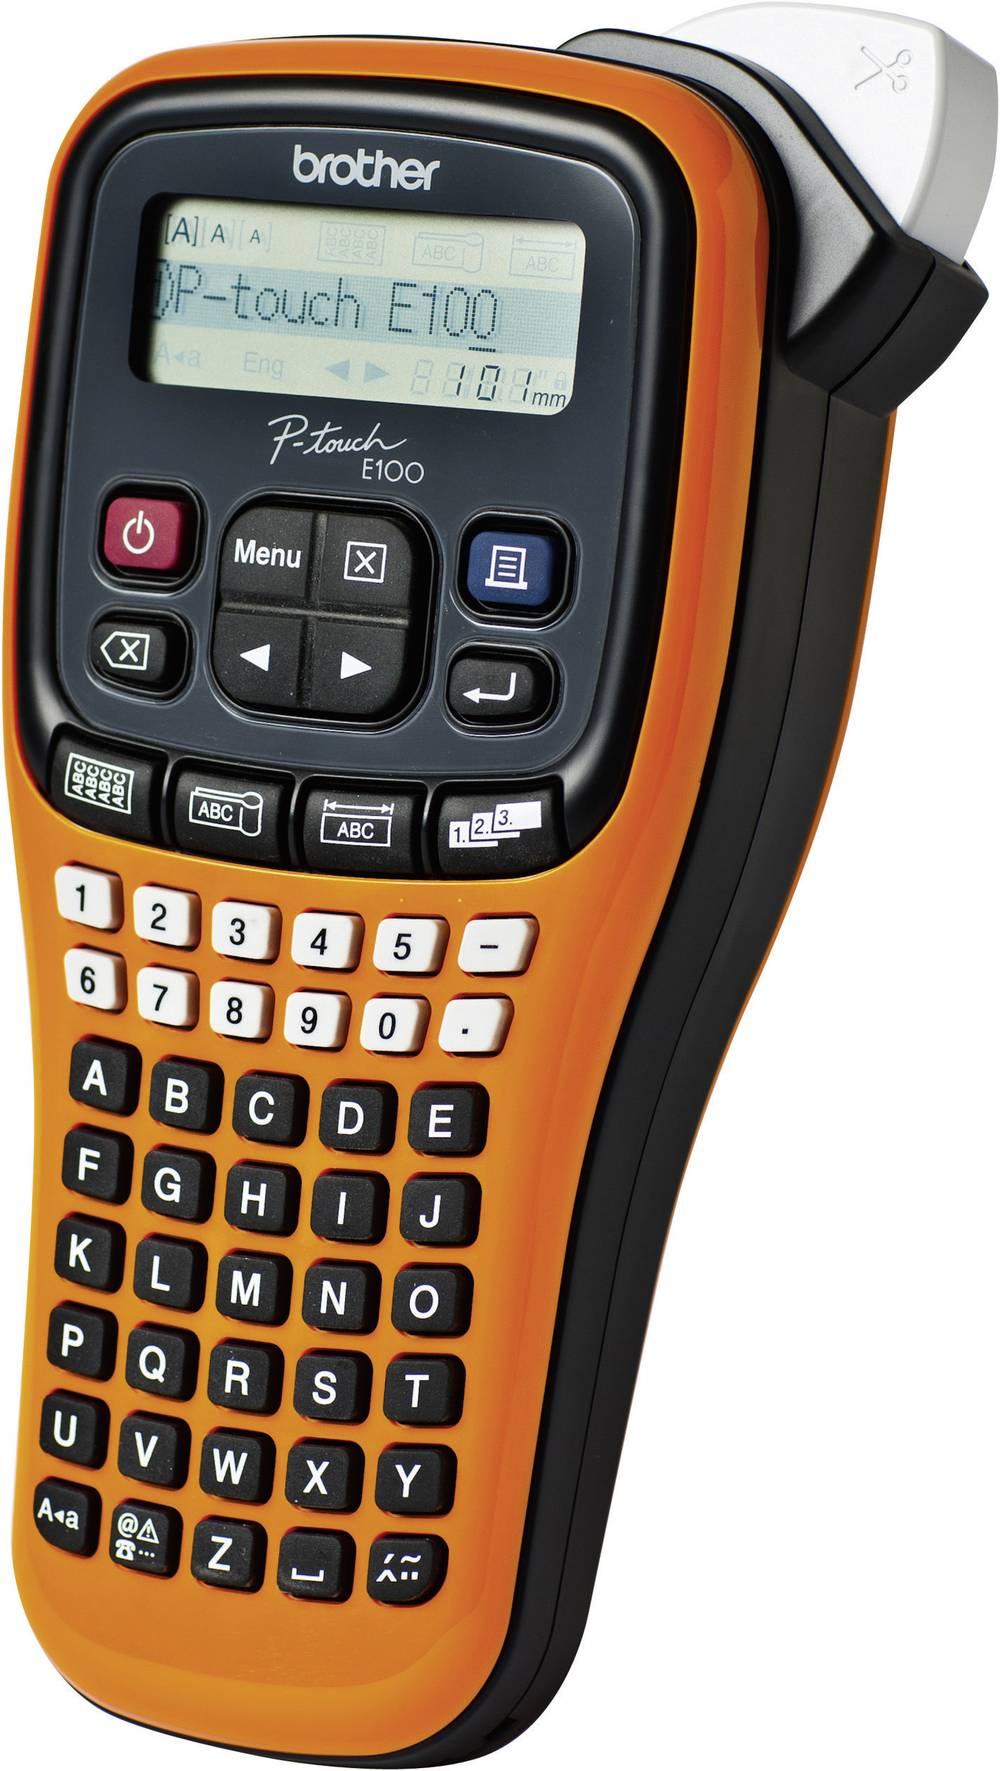 Uređaj za izradu oznaka Brother P-touch E100 za oznake veličine: TZ 3.5 mm, 6 mm, 9 mm, 12 mm PTE100G1